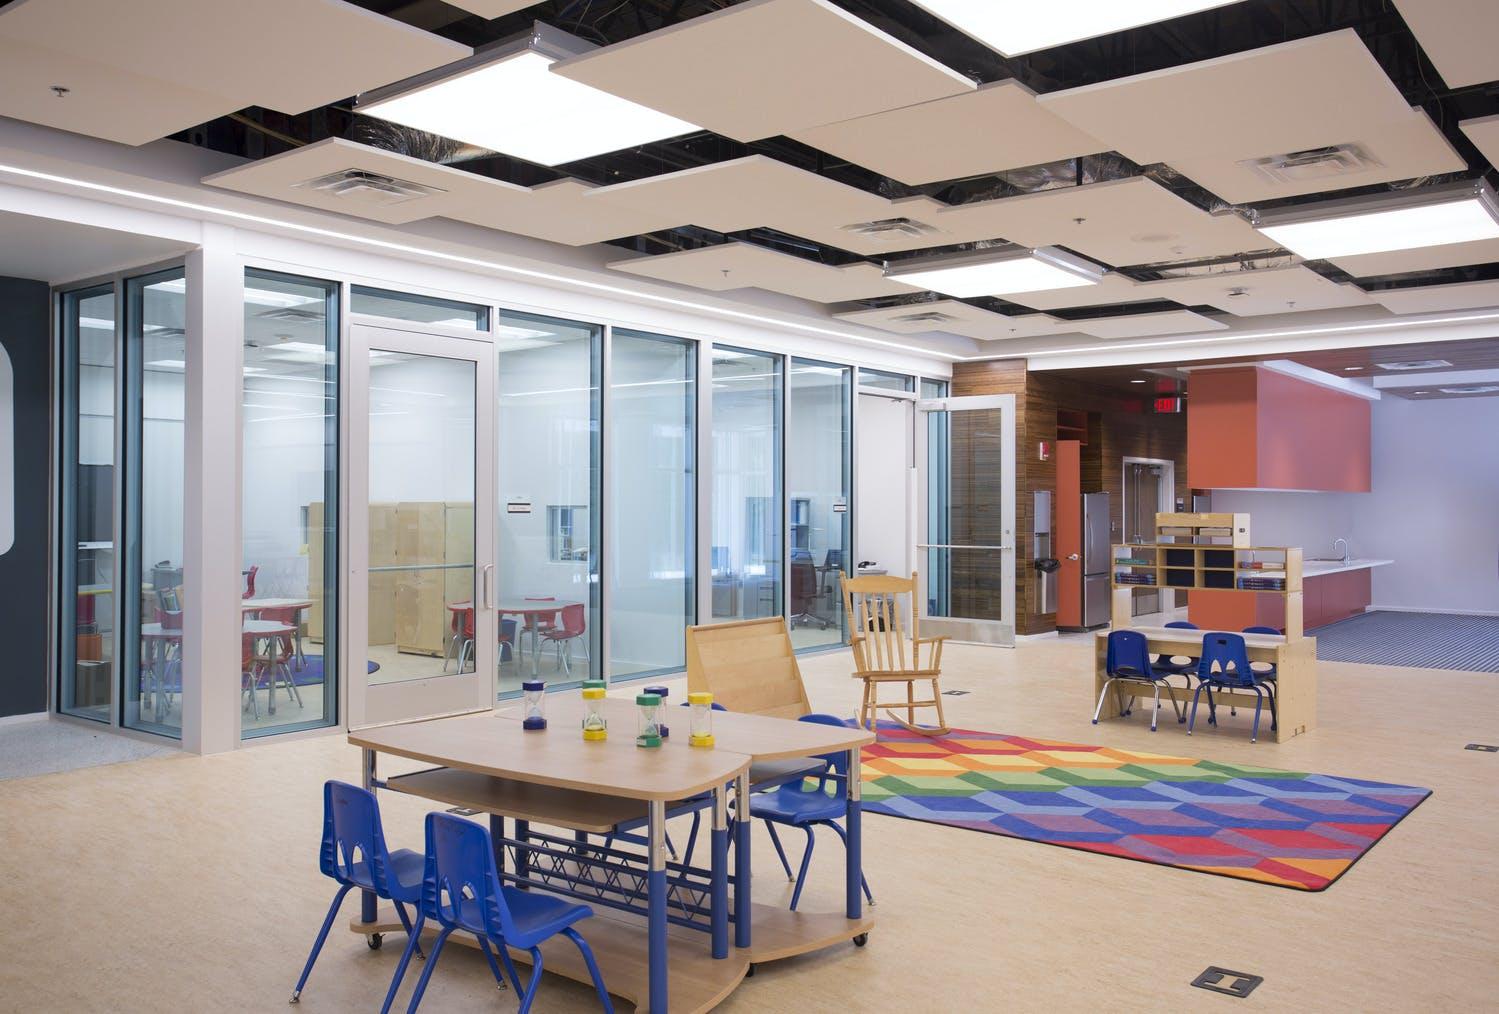 Mc Bride Elementary School Gallery Images